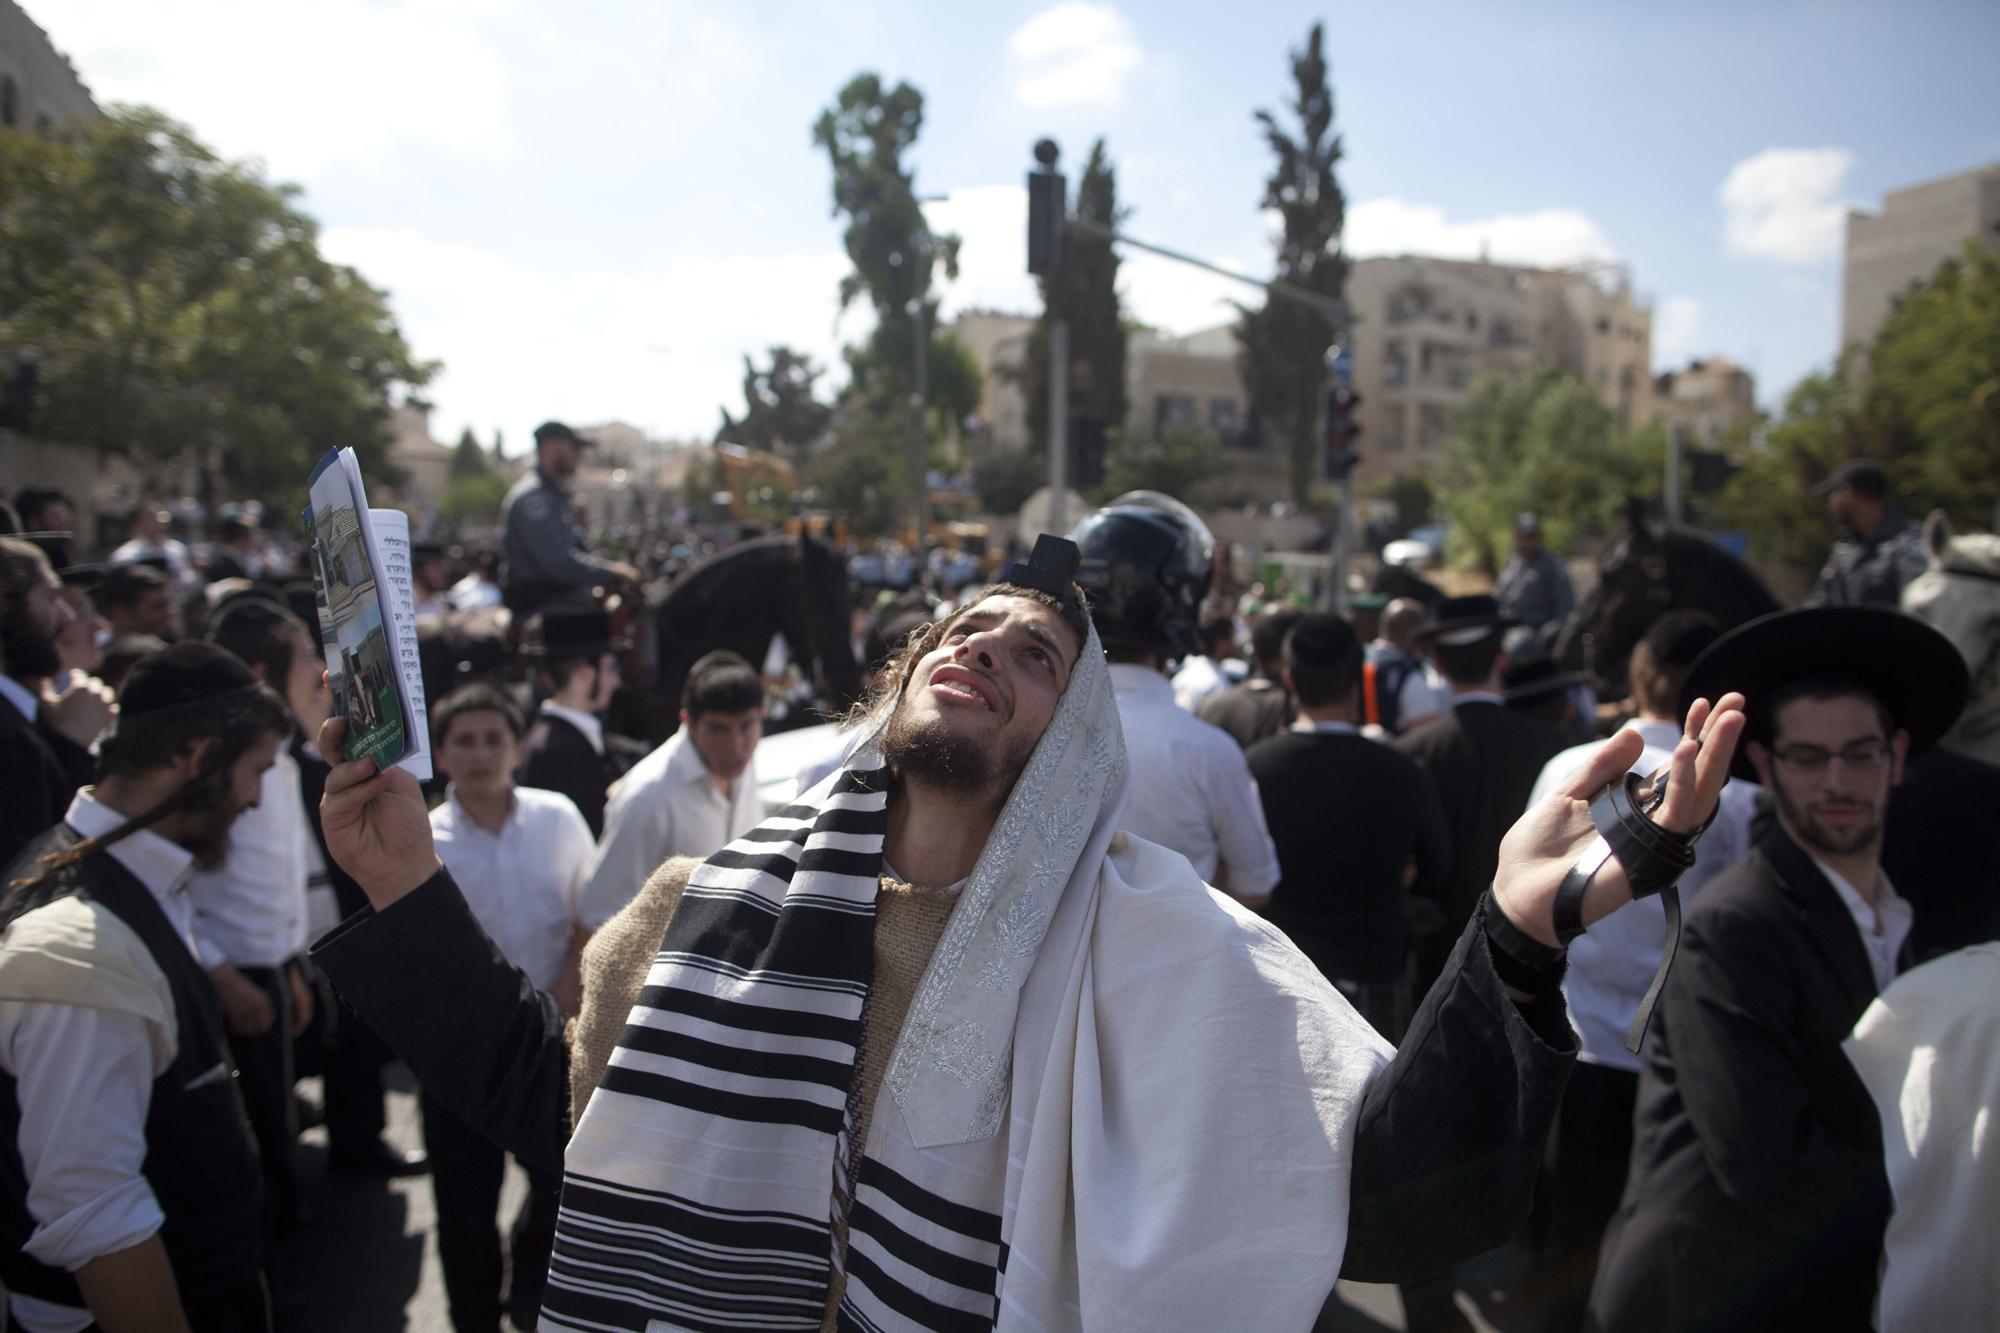 An Ultra Orthodox Jewish man prays near where a Palestinian man rammed an excavator into a bus on Aug. 4, 2014 in Jerusalem.